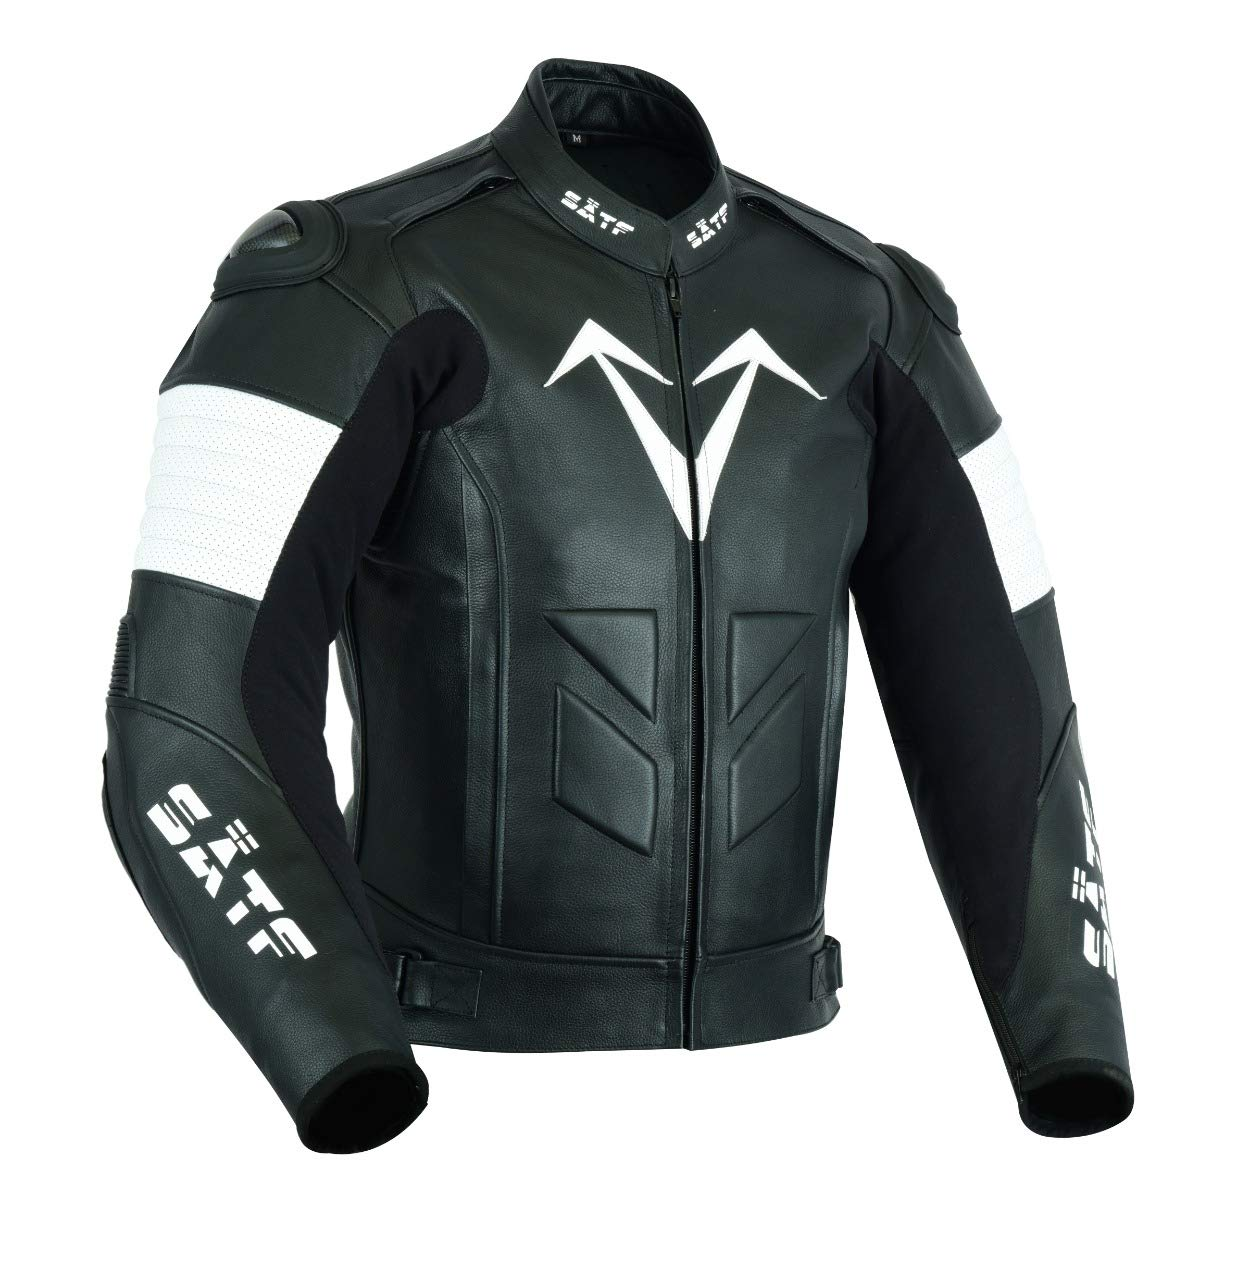 CE Protektoren L, Schwarz//Wei/ß S/ÄTF Leder Motorradjacke Lederjacke Rindleder Biker mit Level 2